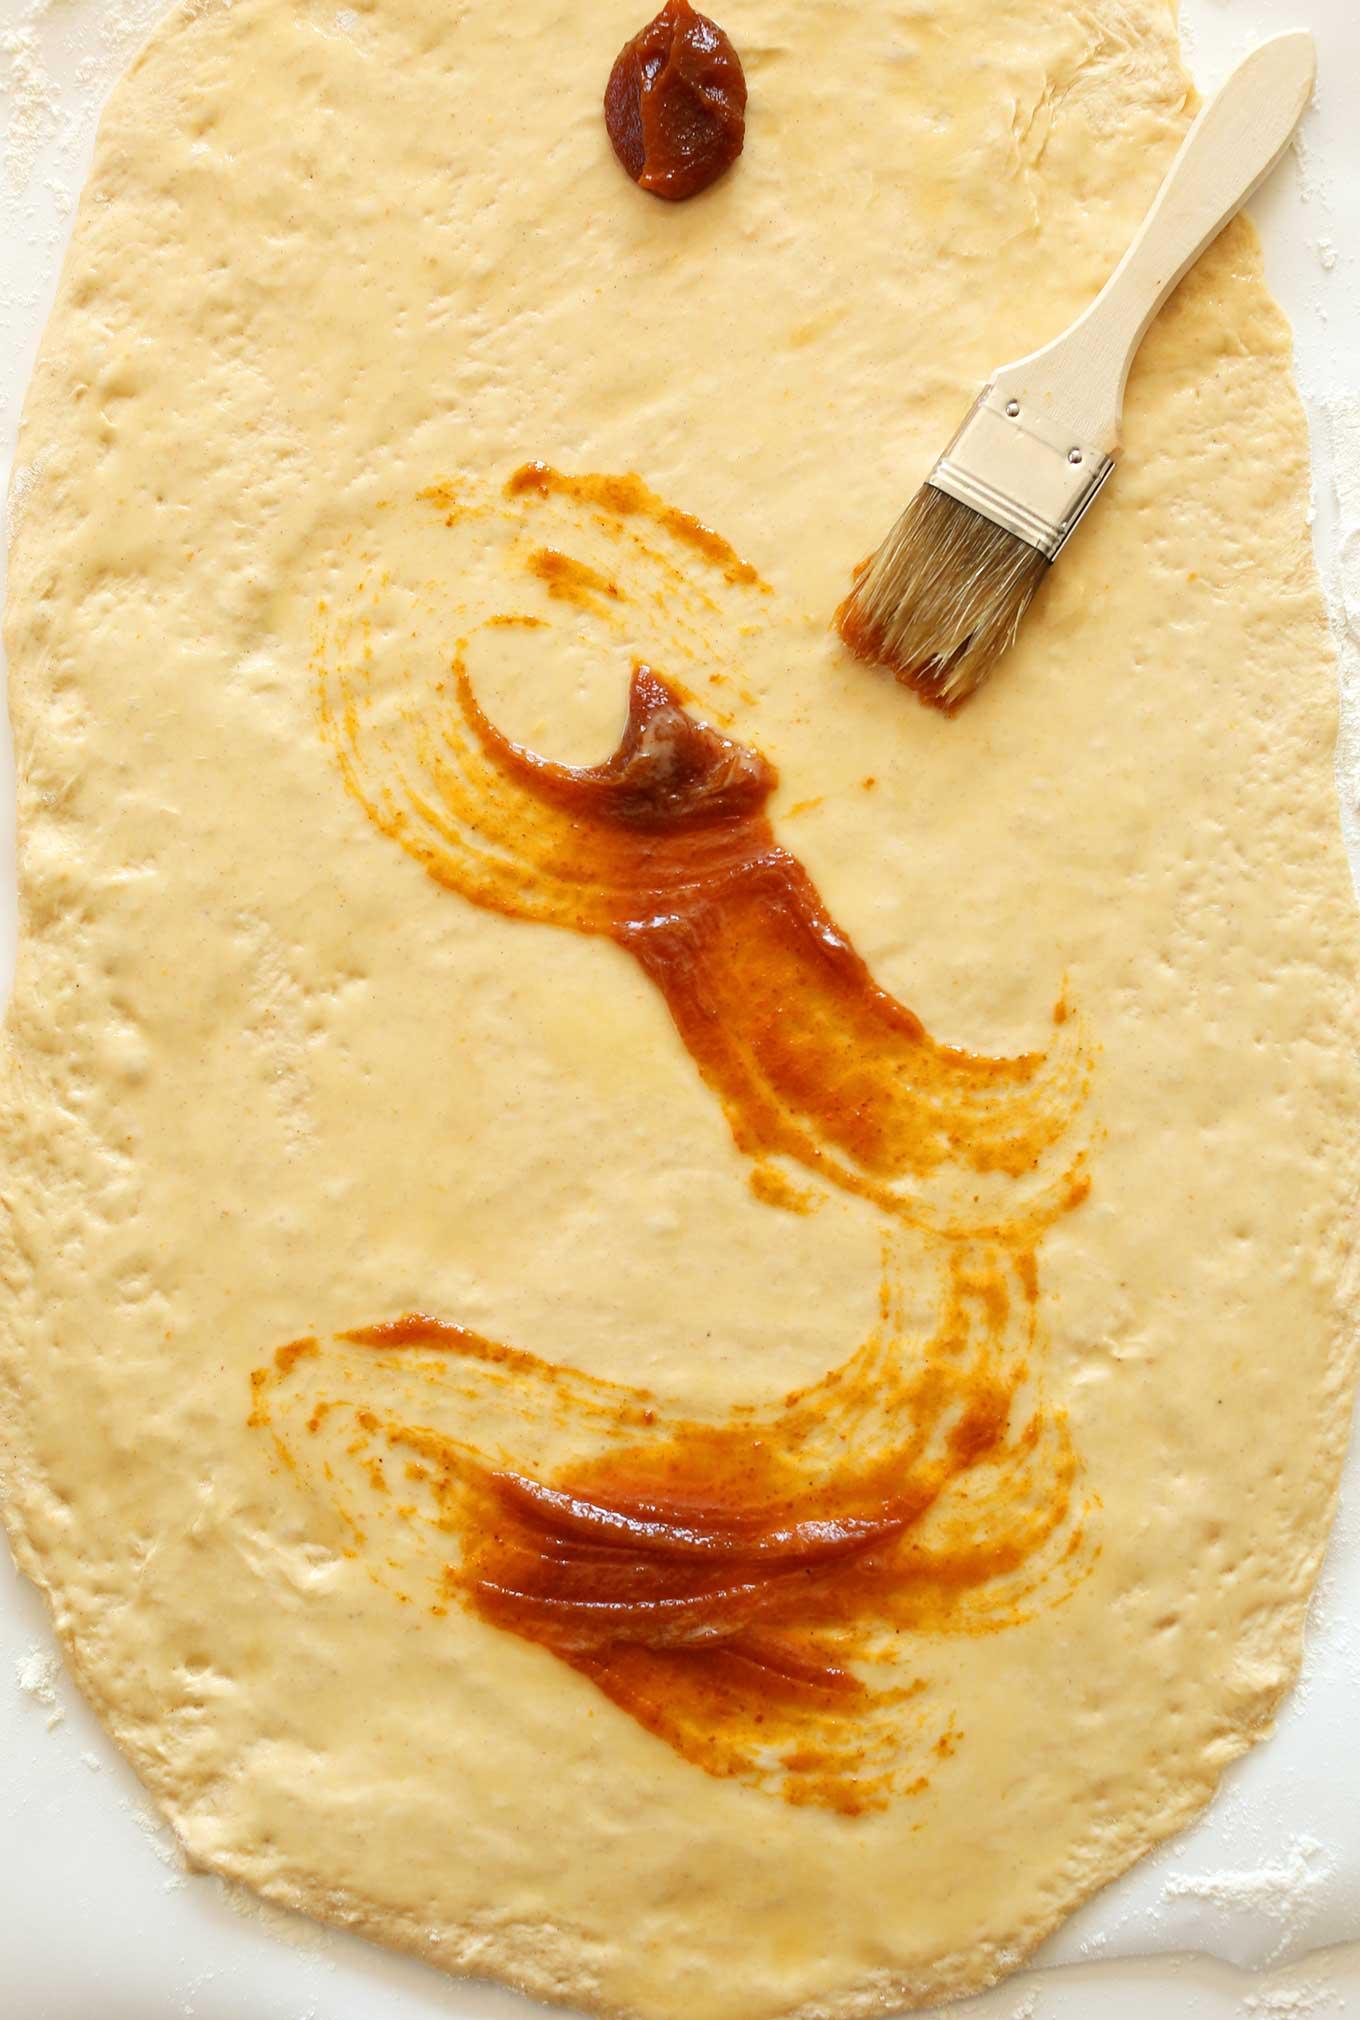 1-Bowl VEGAN Pumpkin Cinnamon Rolls! Simple, spicy, delicious! #vegan #minimalistbaker